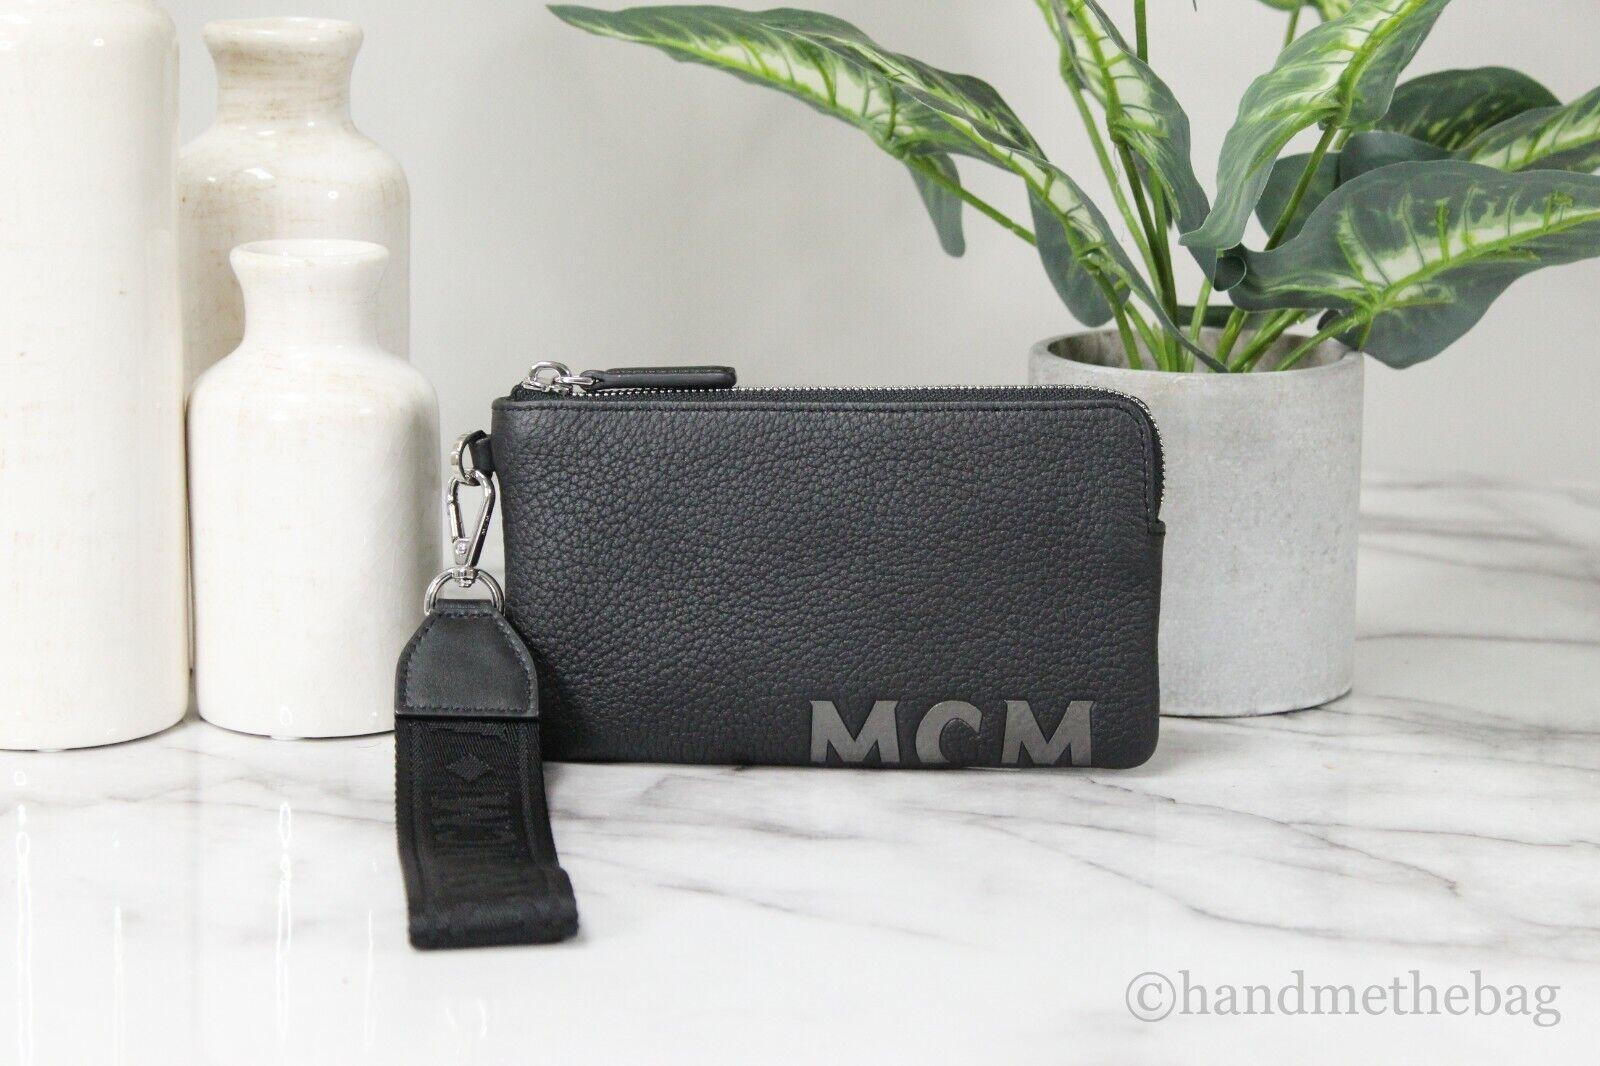 MCM Large Black Pebble Leather Zipped Multifunction Logo Wristlet Clutch Wallet